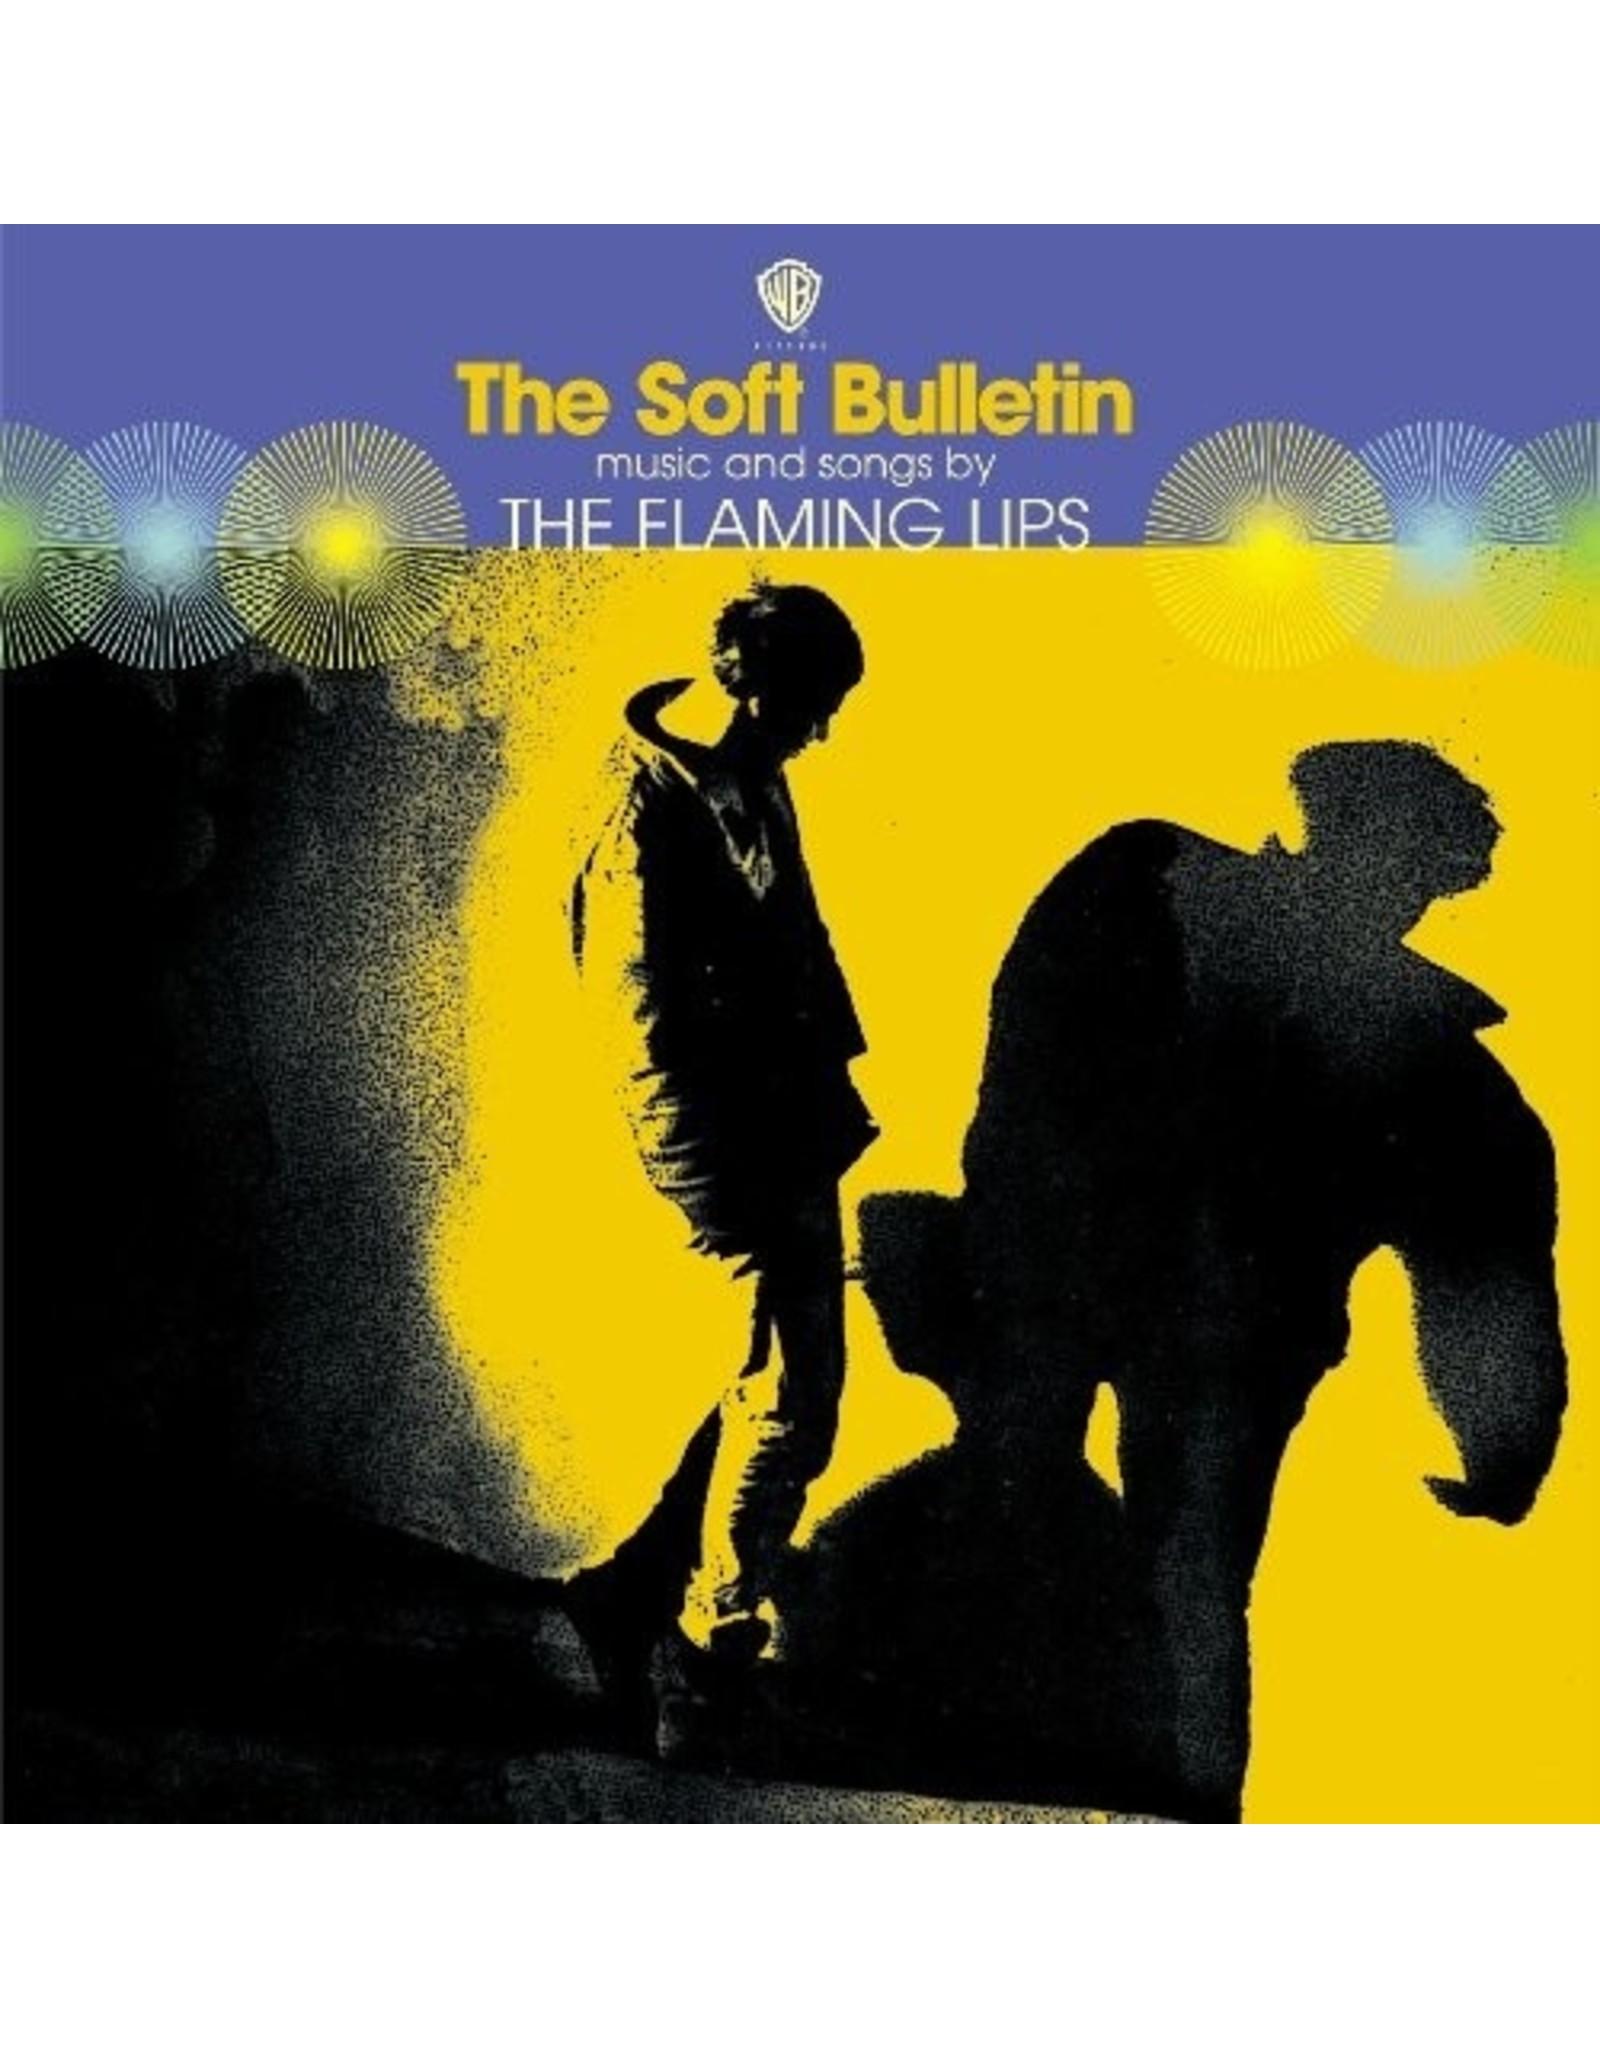 New Vinyl Flaming Lips - Soft Bulletin 2LP